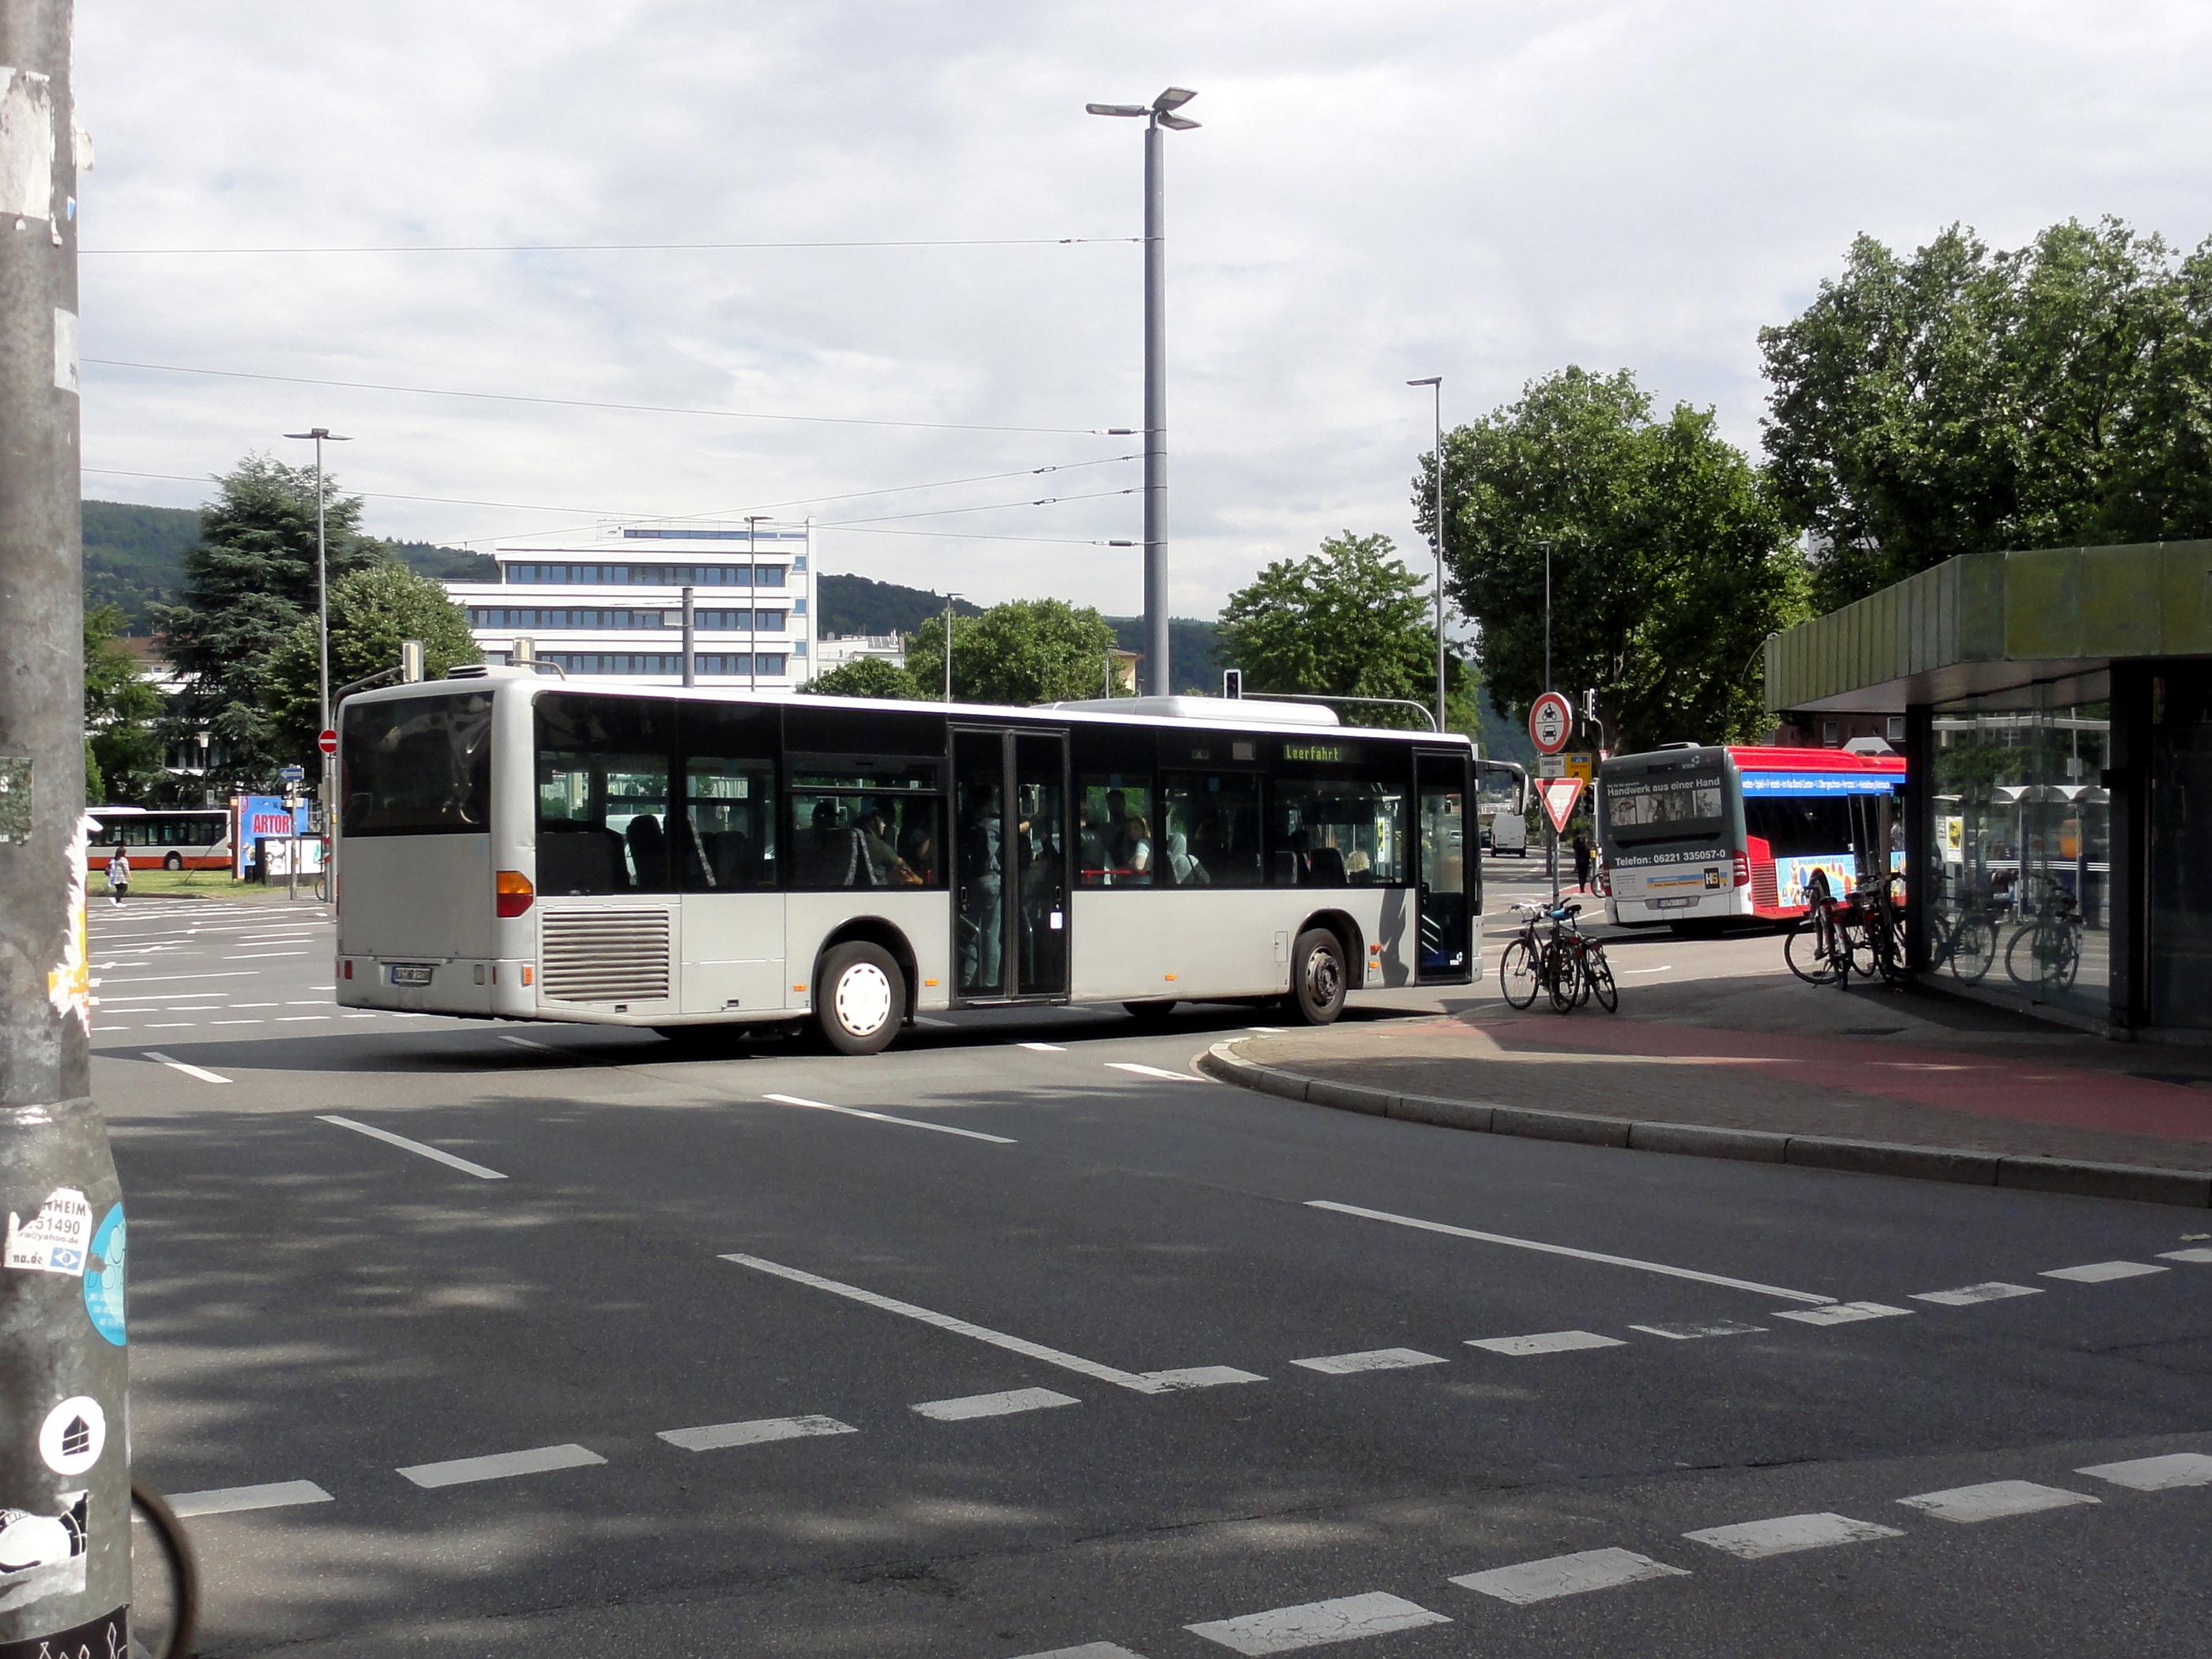 File:Hoffmann-2318 Hd Hbf Einfahrt.jpg